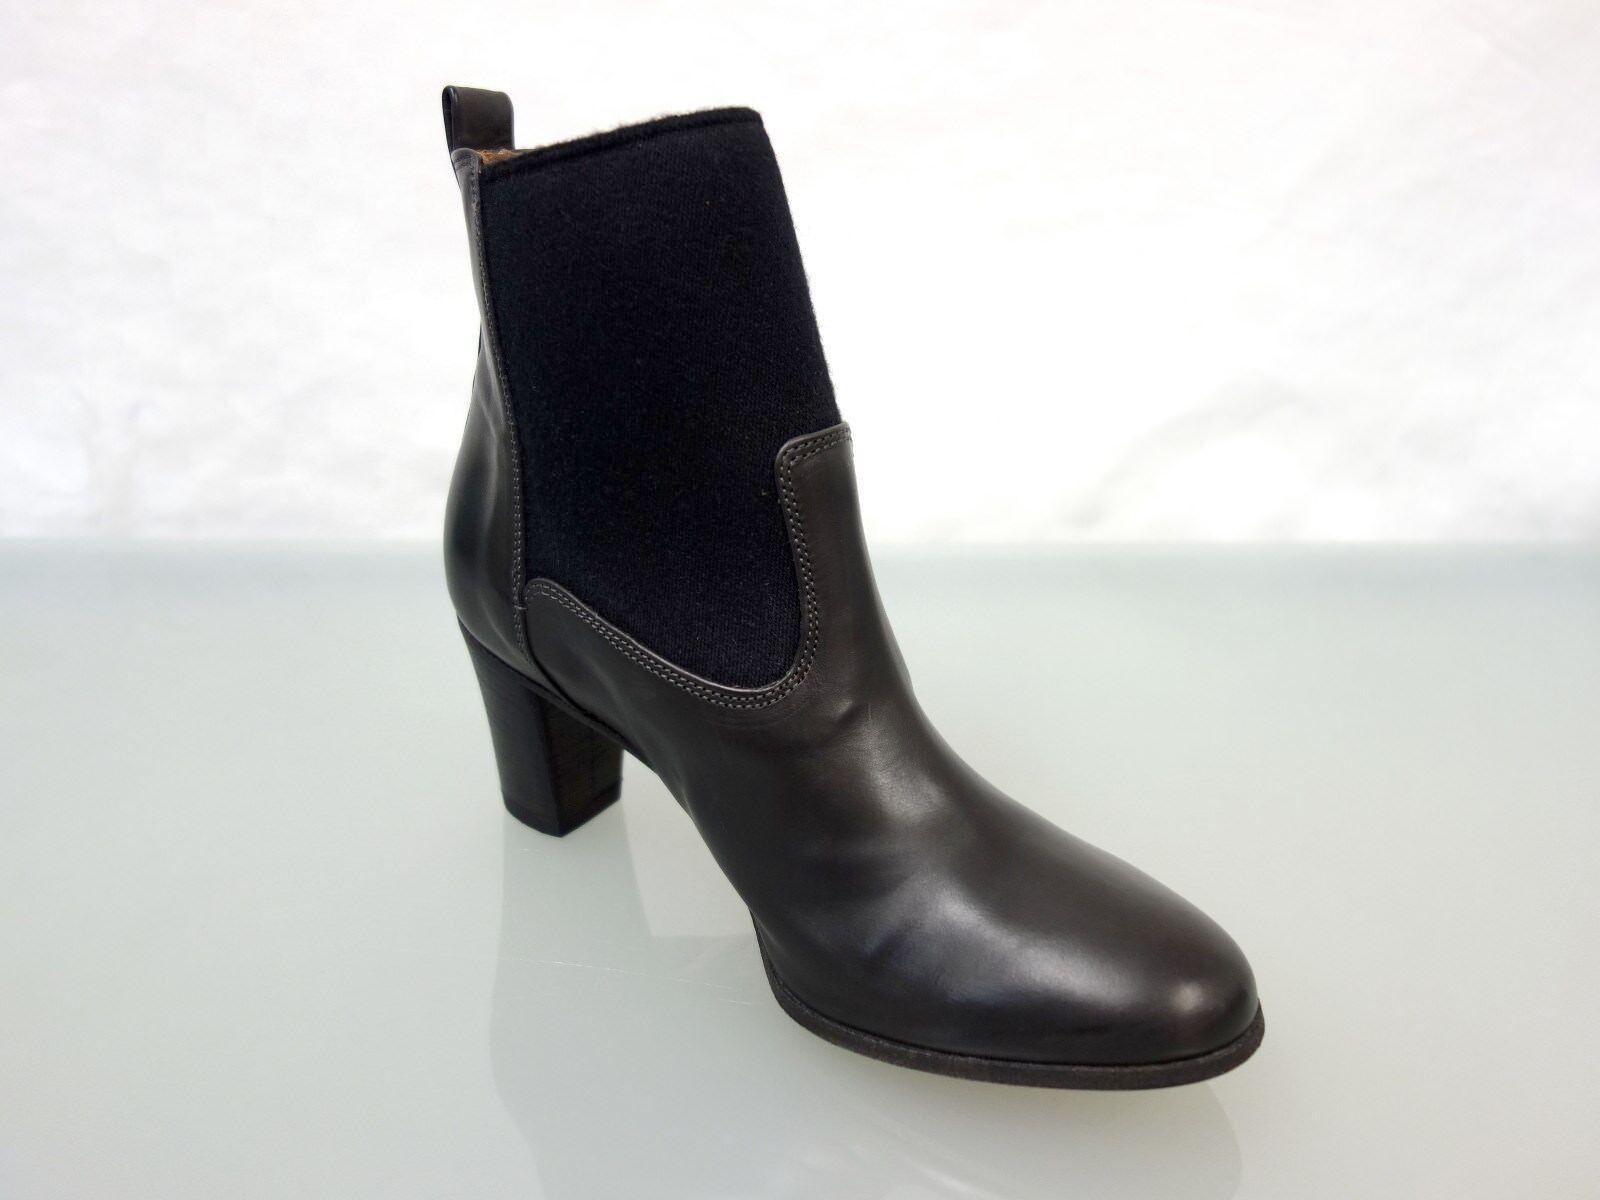 NEU Stiefelette ALBERTO FERMANI Leder Stiefel Stiefelette NEU Gr.36,5 Ankle Stiefel Schwarz 02117d